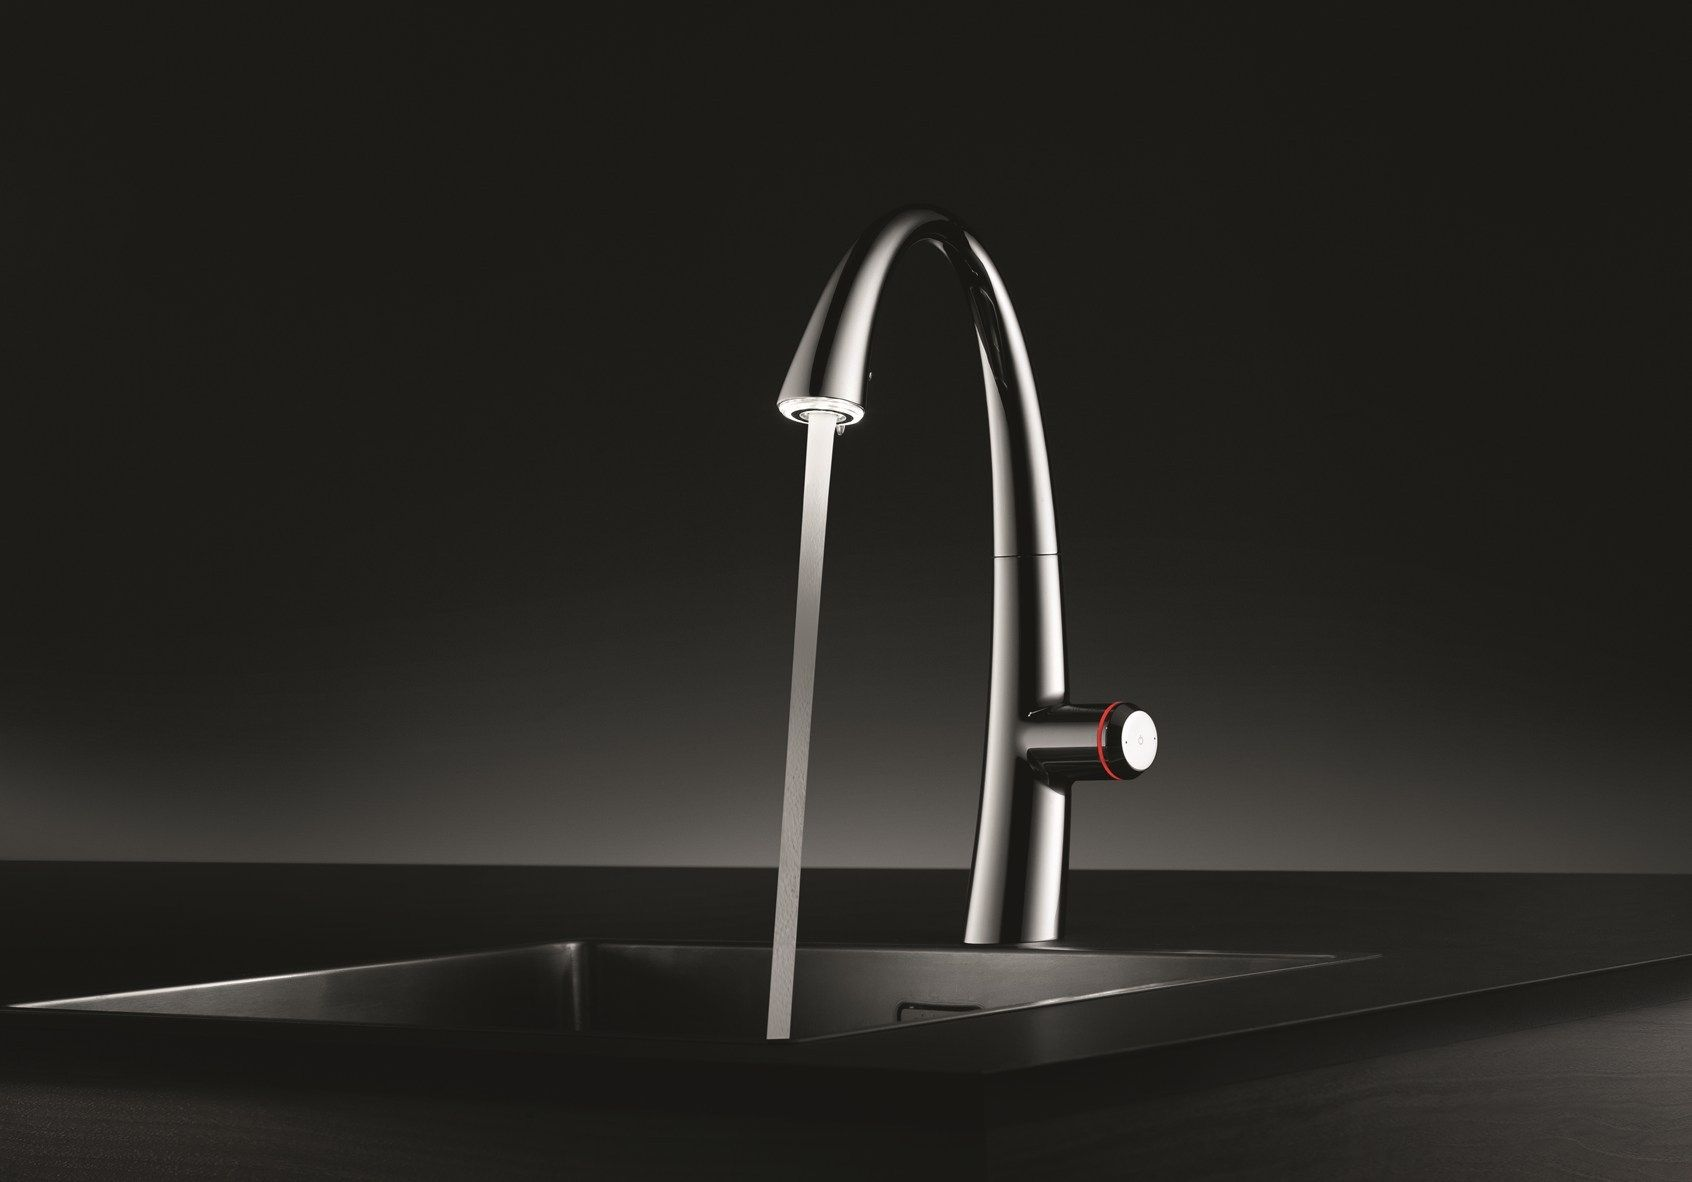 mixer k galleries product faucets faucet original sin lever b catalog kwc single